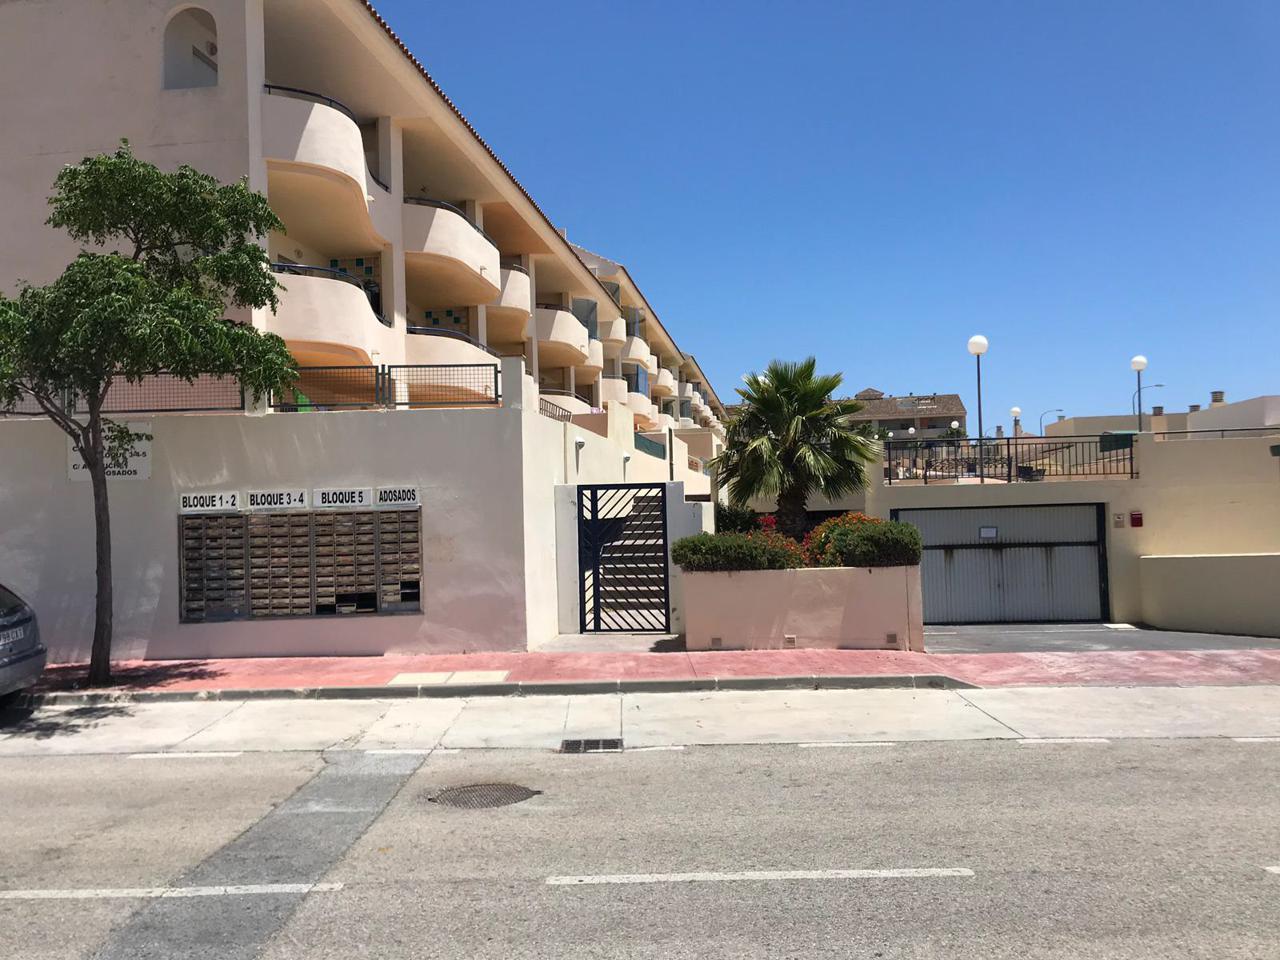 Calle,  JALEA, RESIDENCIAL IRCOSOL PANORAMIC,  0,  29631,  Benalmádena